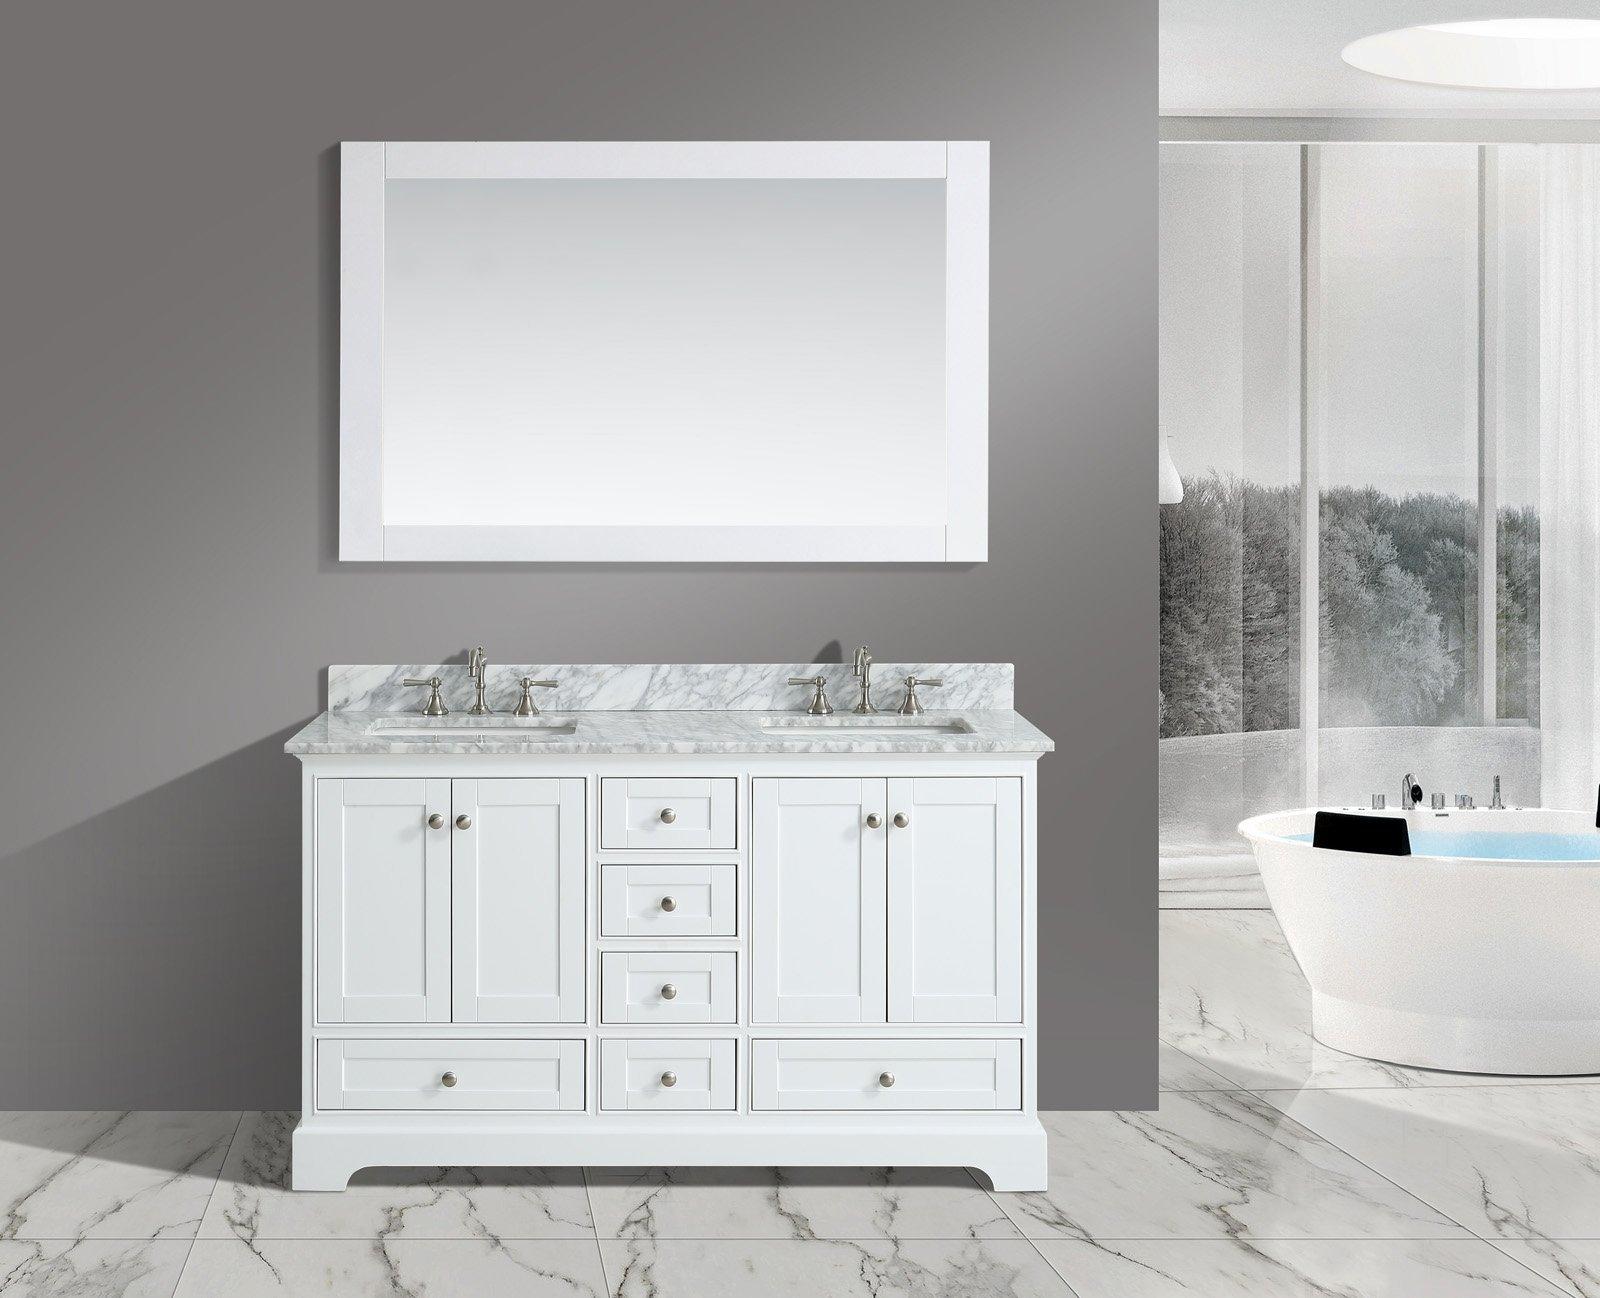 UrbanFurnishing.net - Jocelyn 60-Inch (60'') Bathroom Sink Vanity Set with White Italian Carrara Marble Top - White by UrbanFurnishing.net